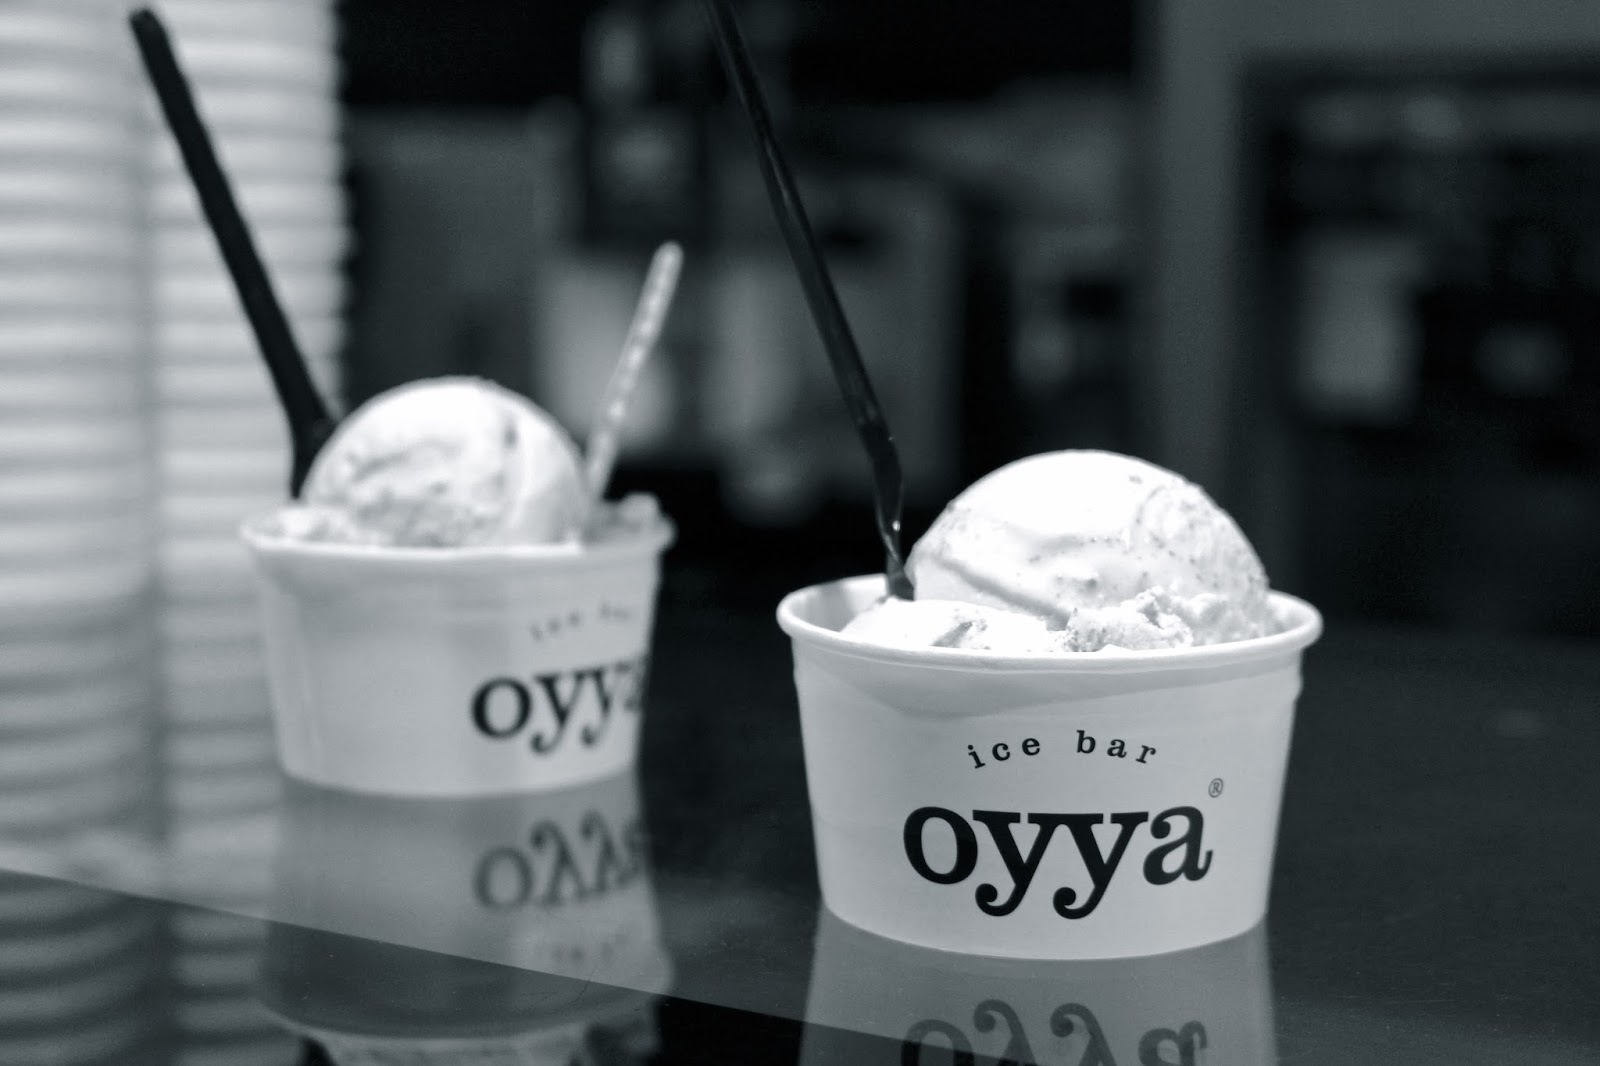 Oyya ice bar travel blogger review Bruges